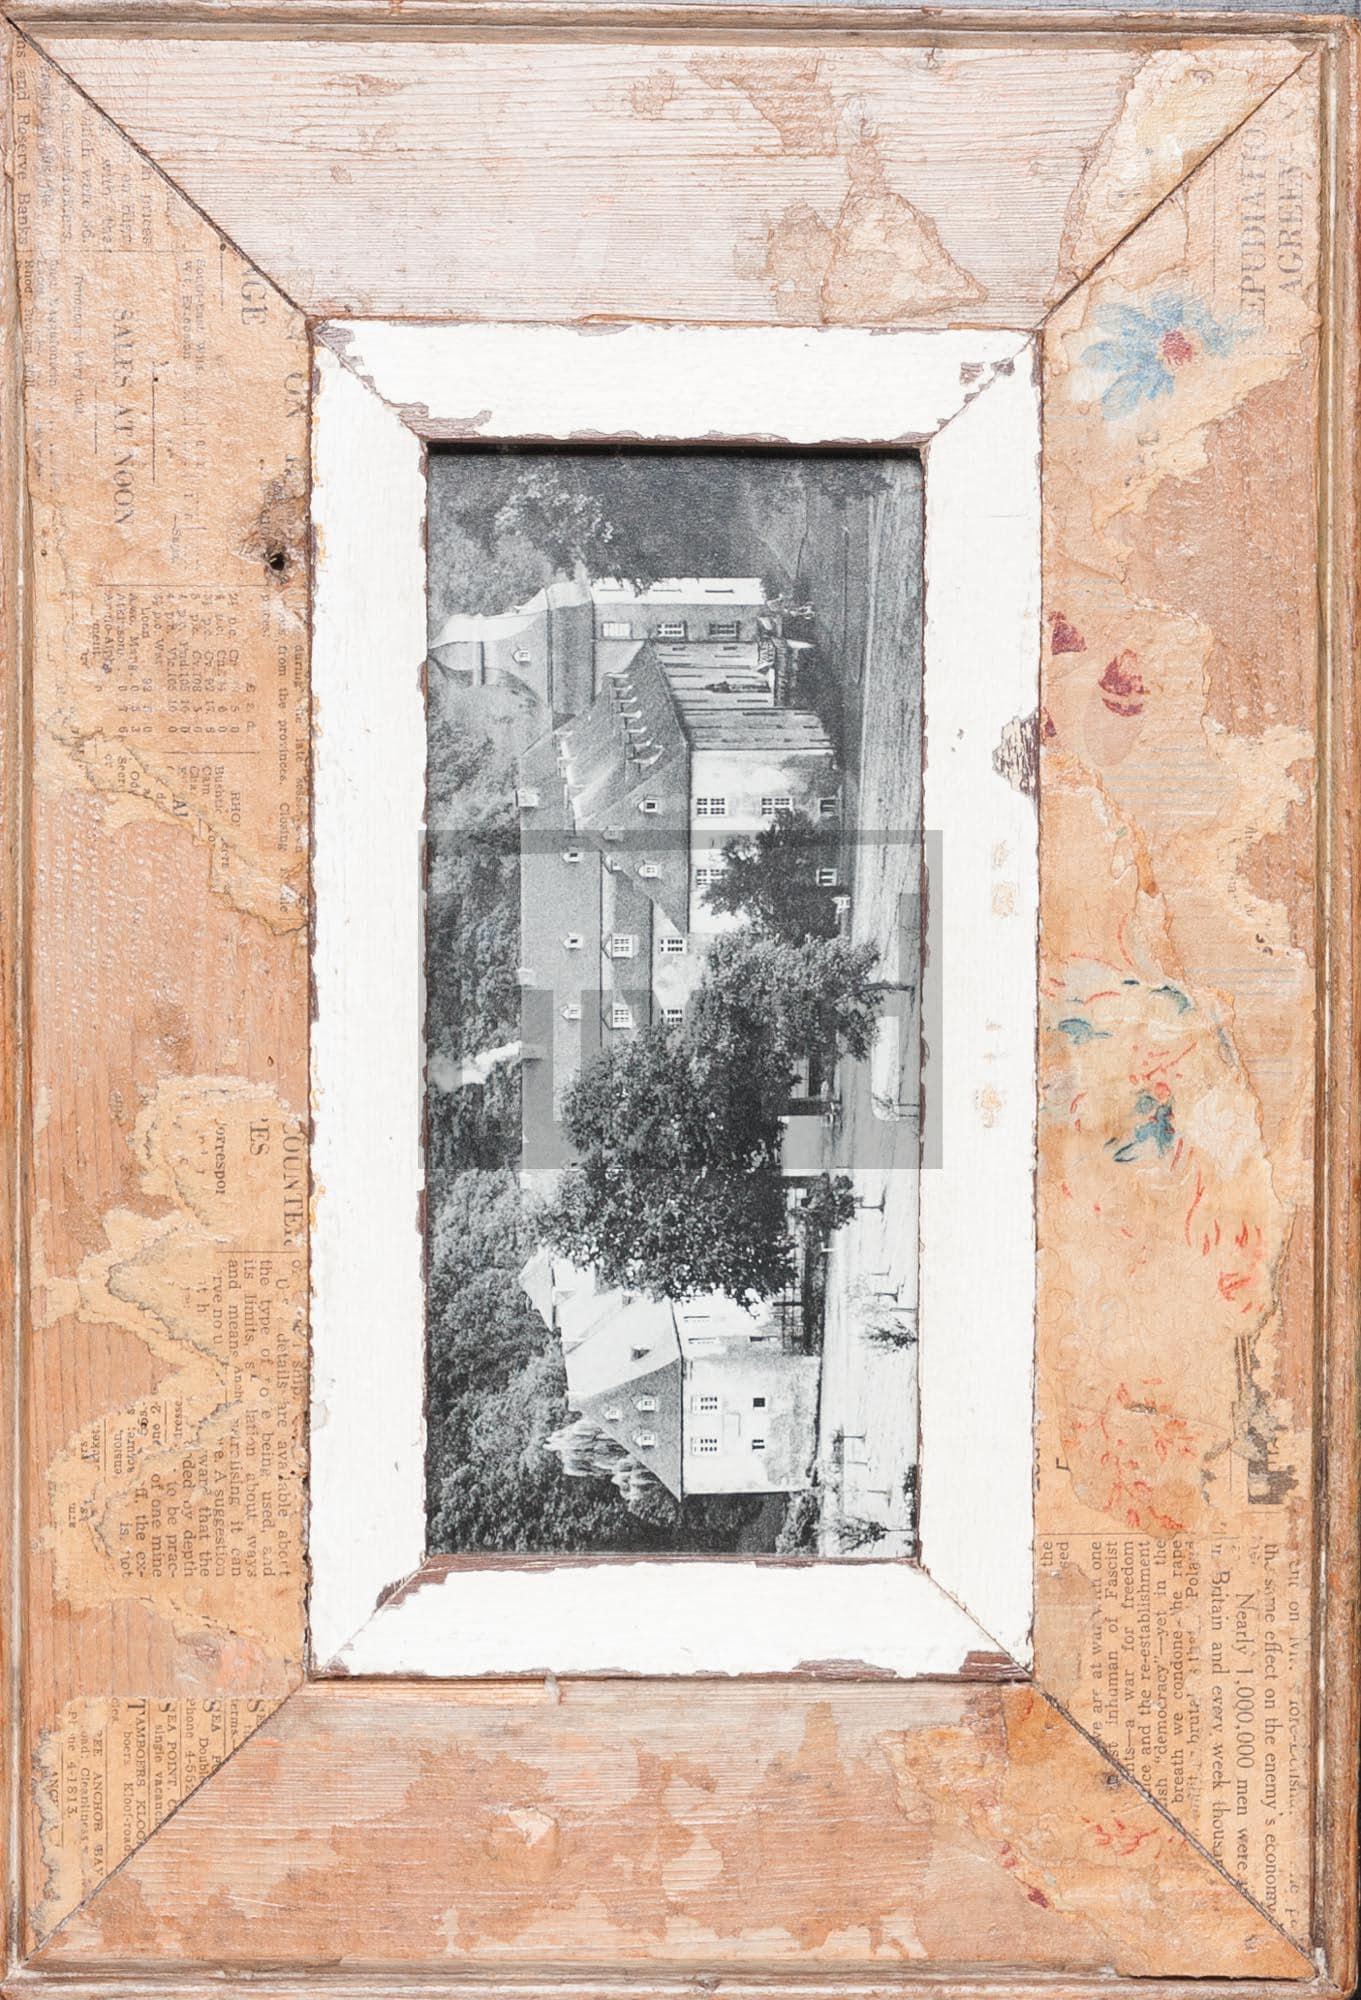 Panorama-Bilderrahmen aus altem Holz für Panoramen 1:2